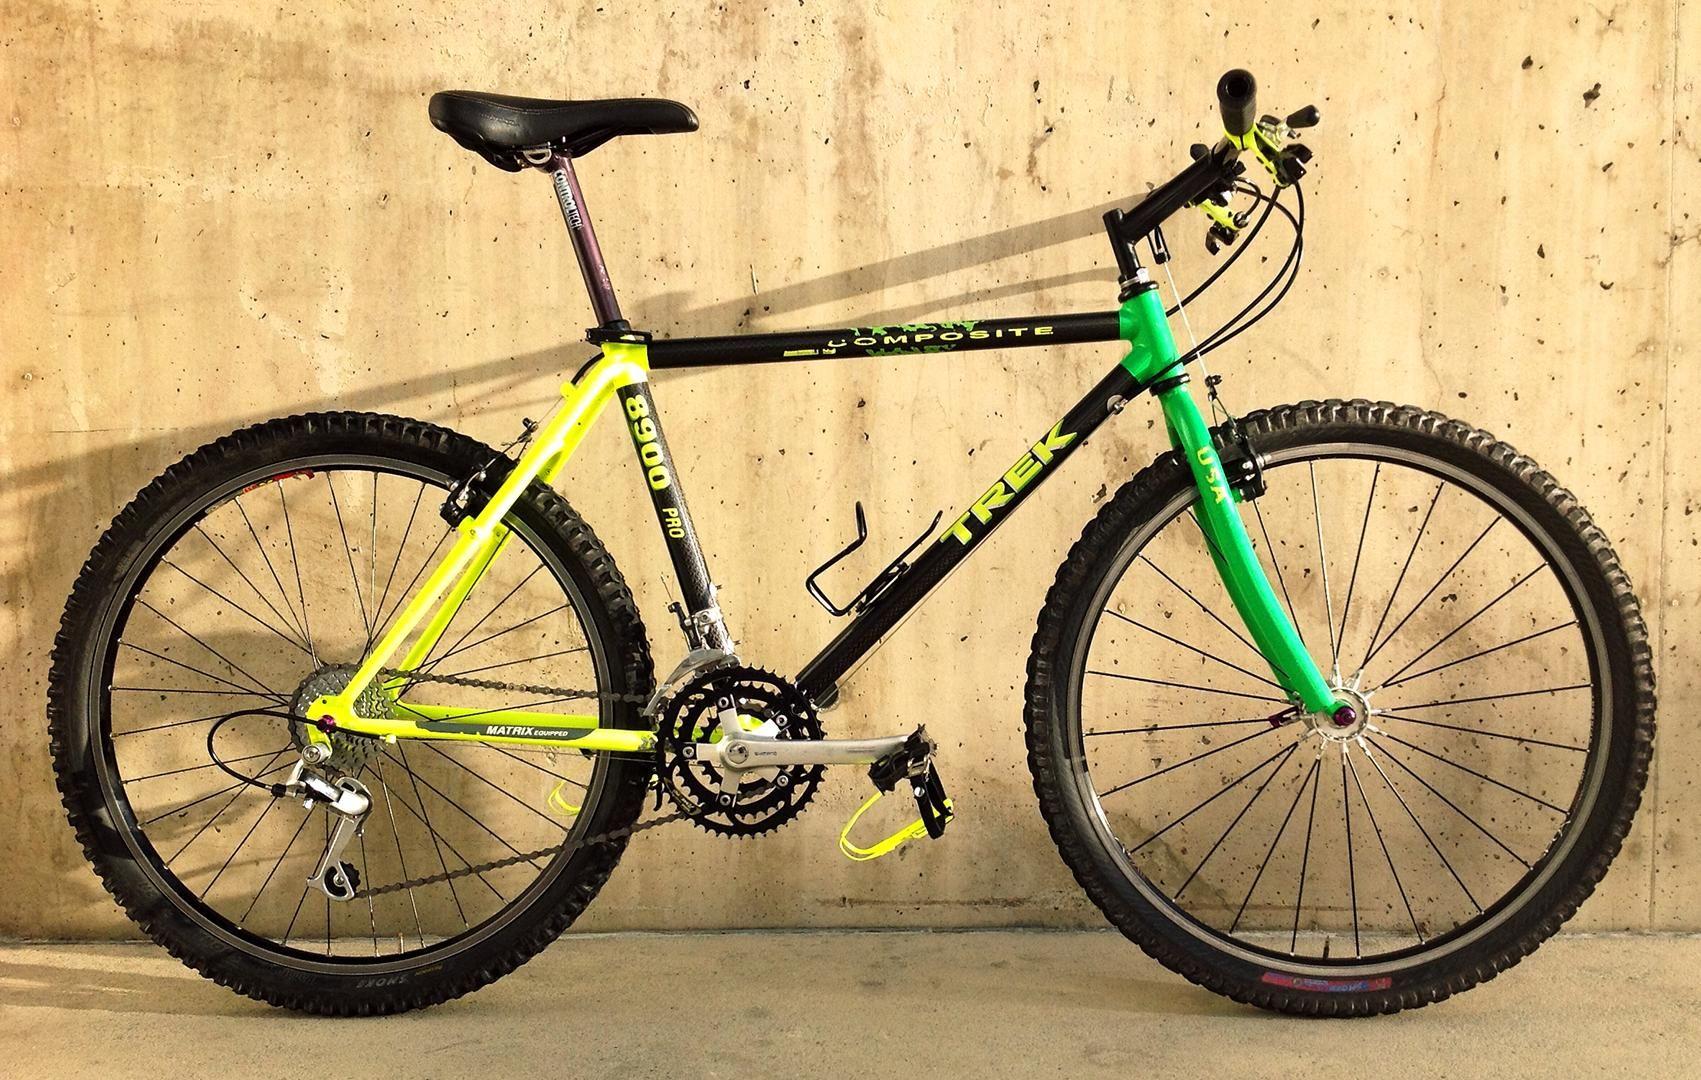 1990 Trek 8900 Vintage Mountain Bike Trek Mountain Bike Bmx Bicycle